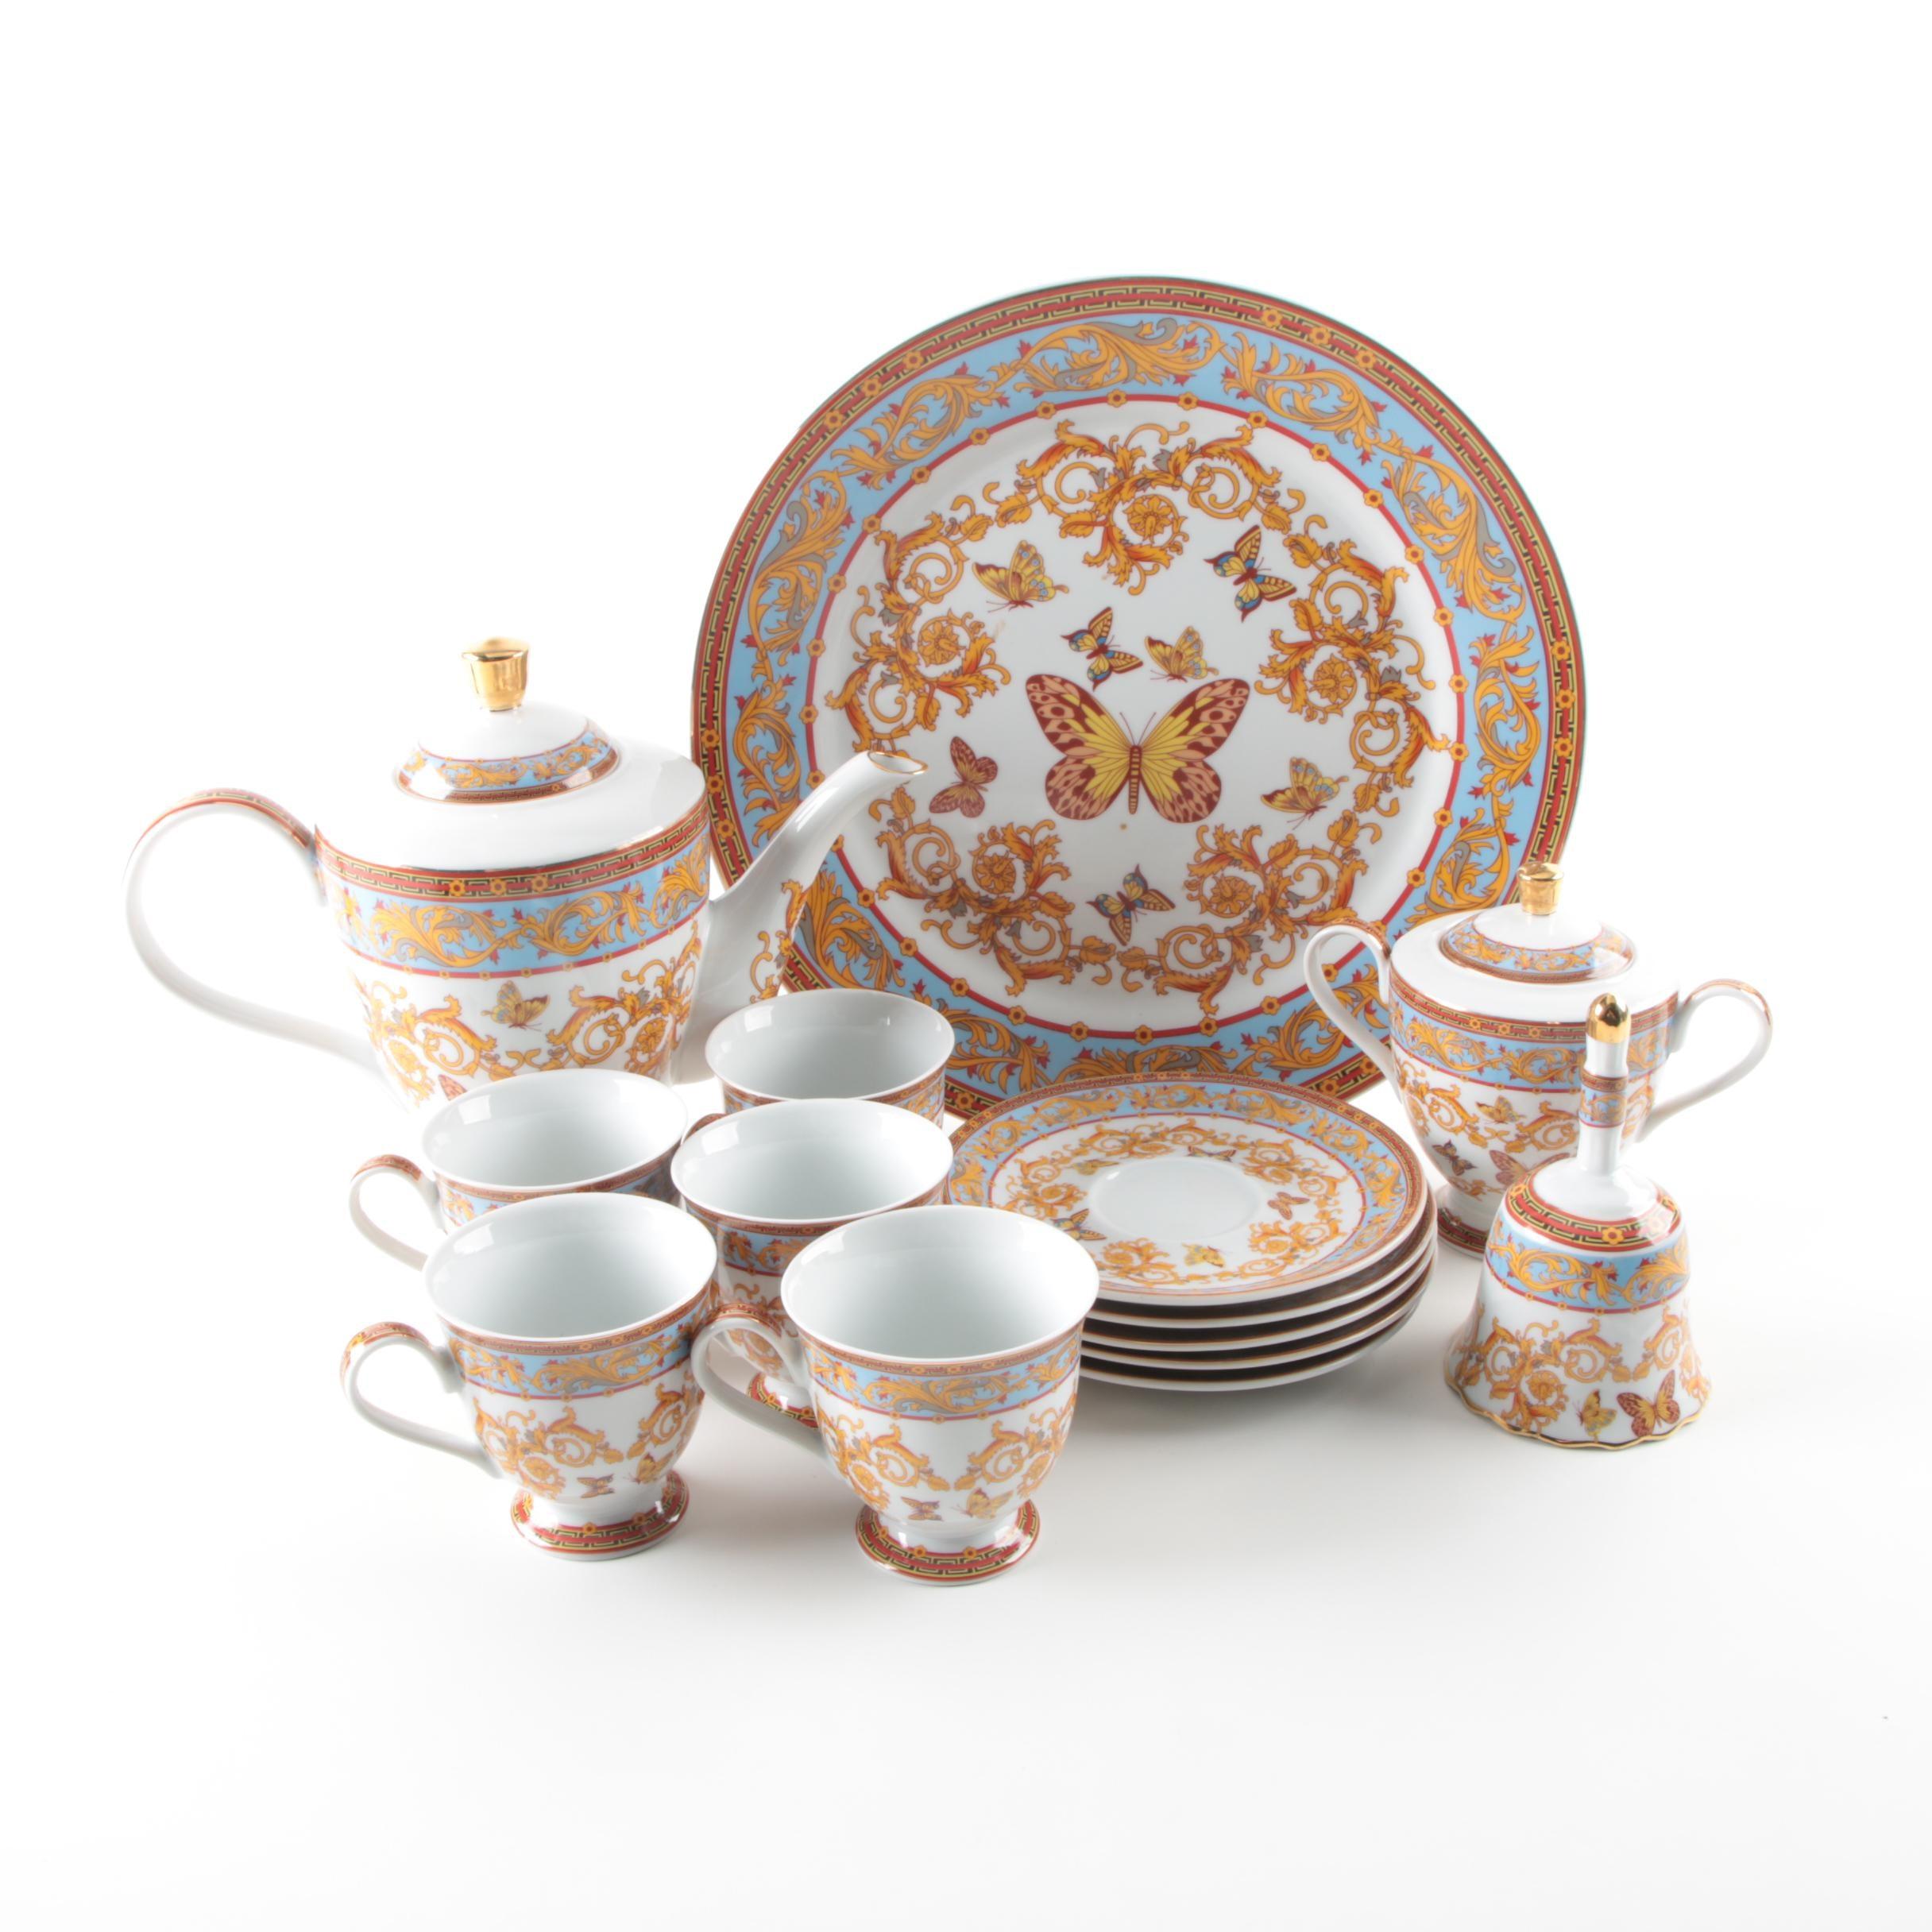 Sorelle Butterfly and Scroll Porcelain Dessert Serving Set